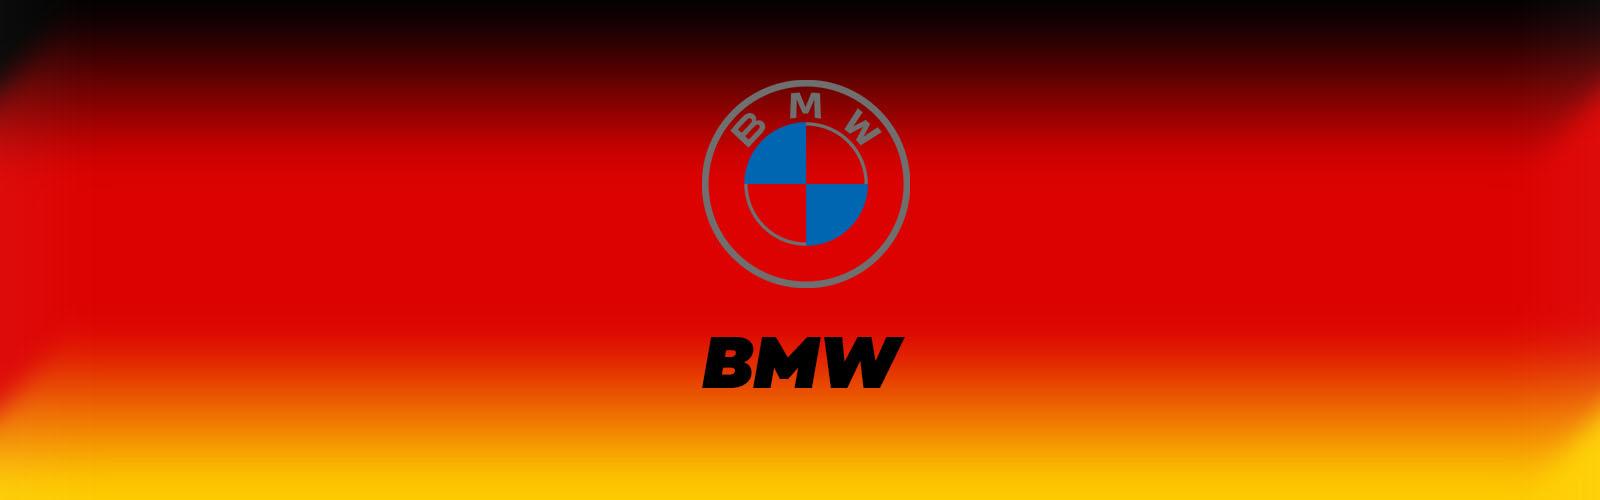 BMW marque logo